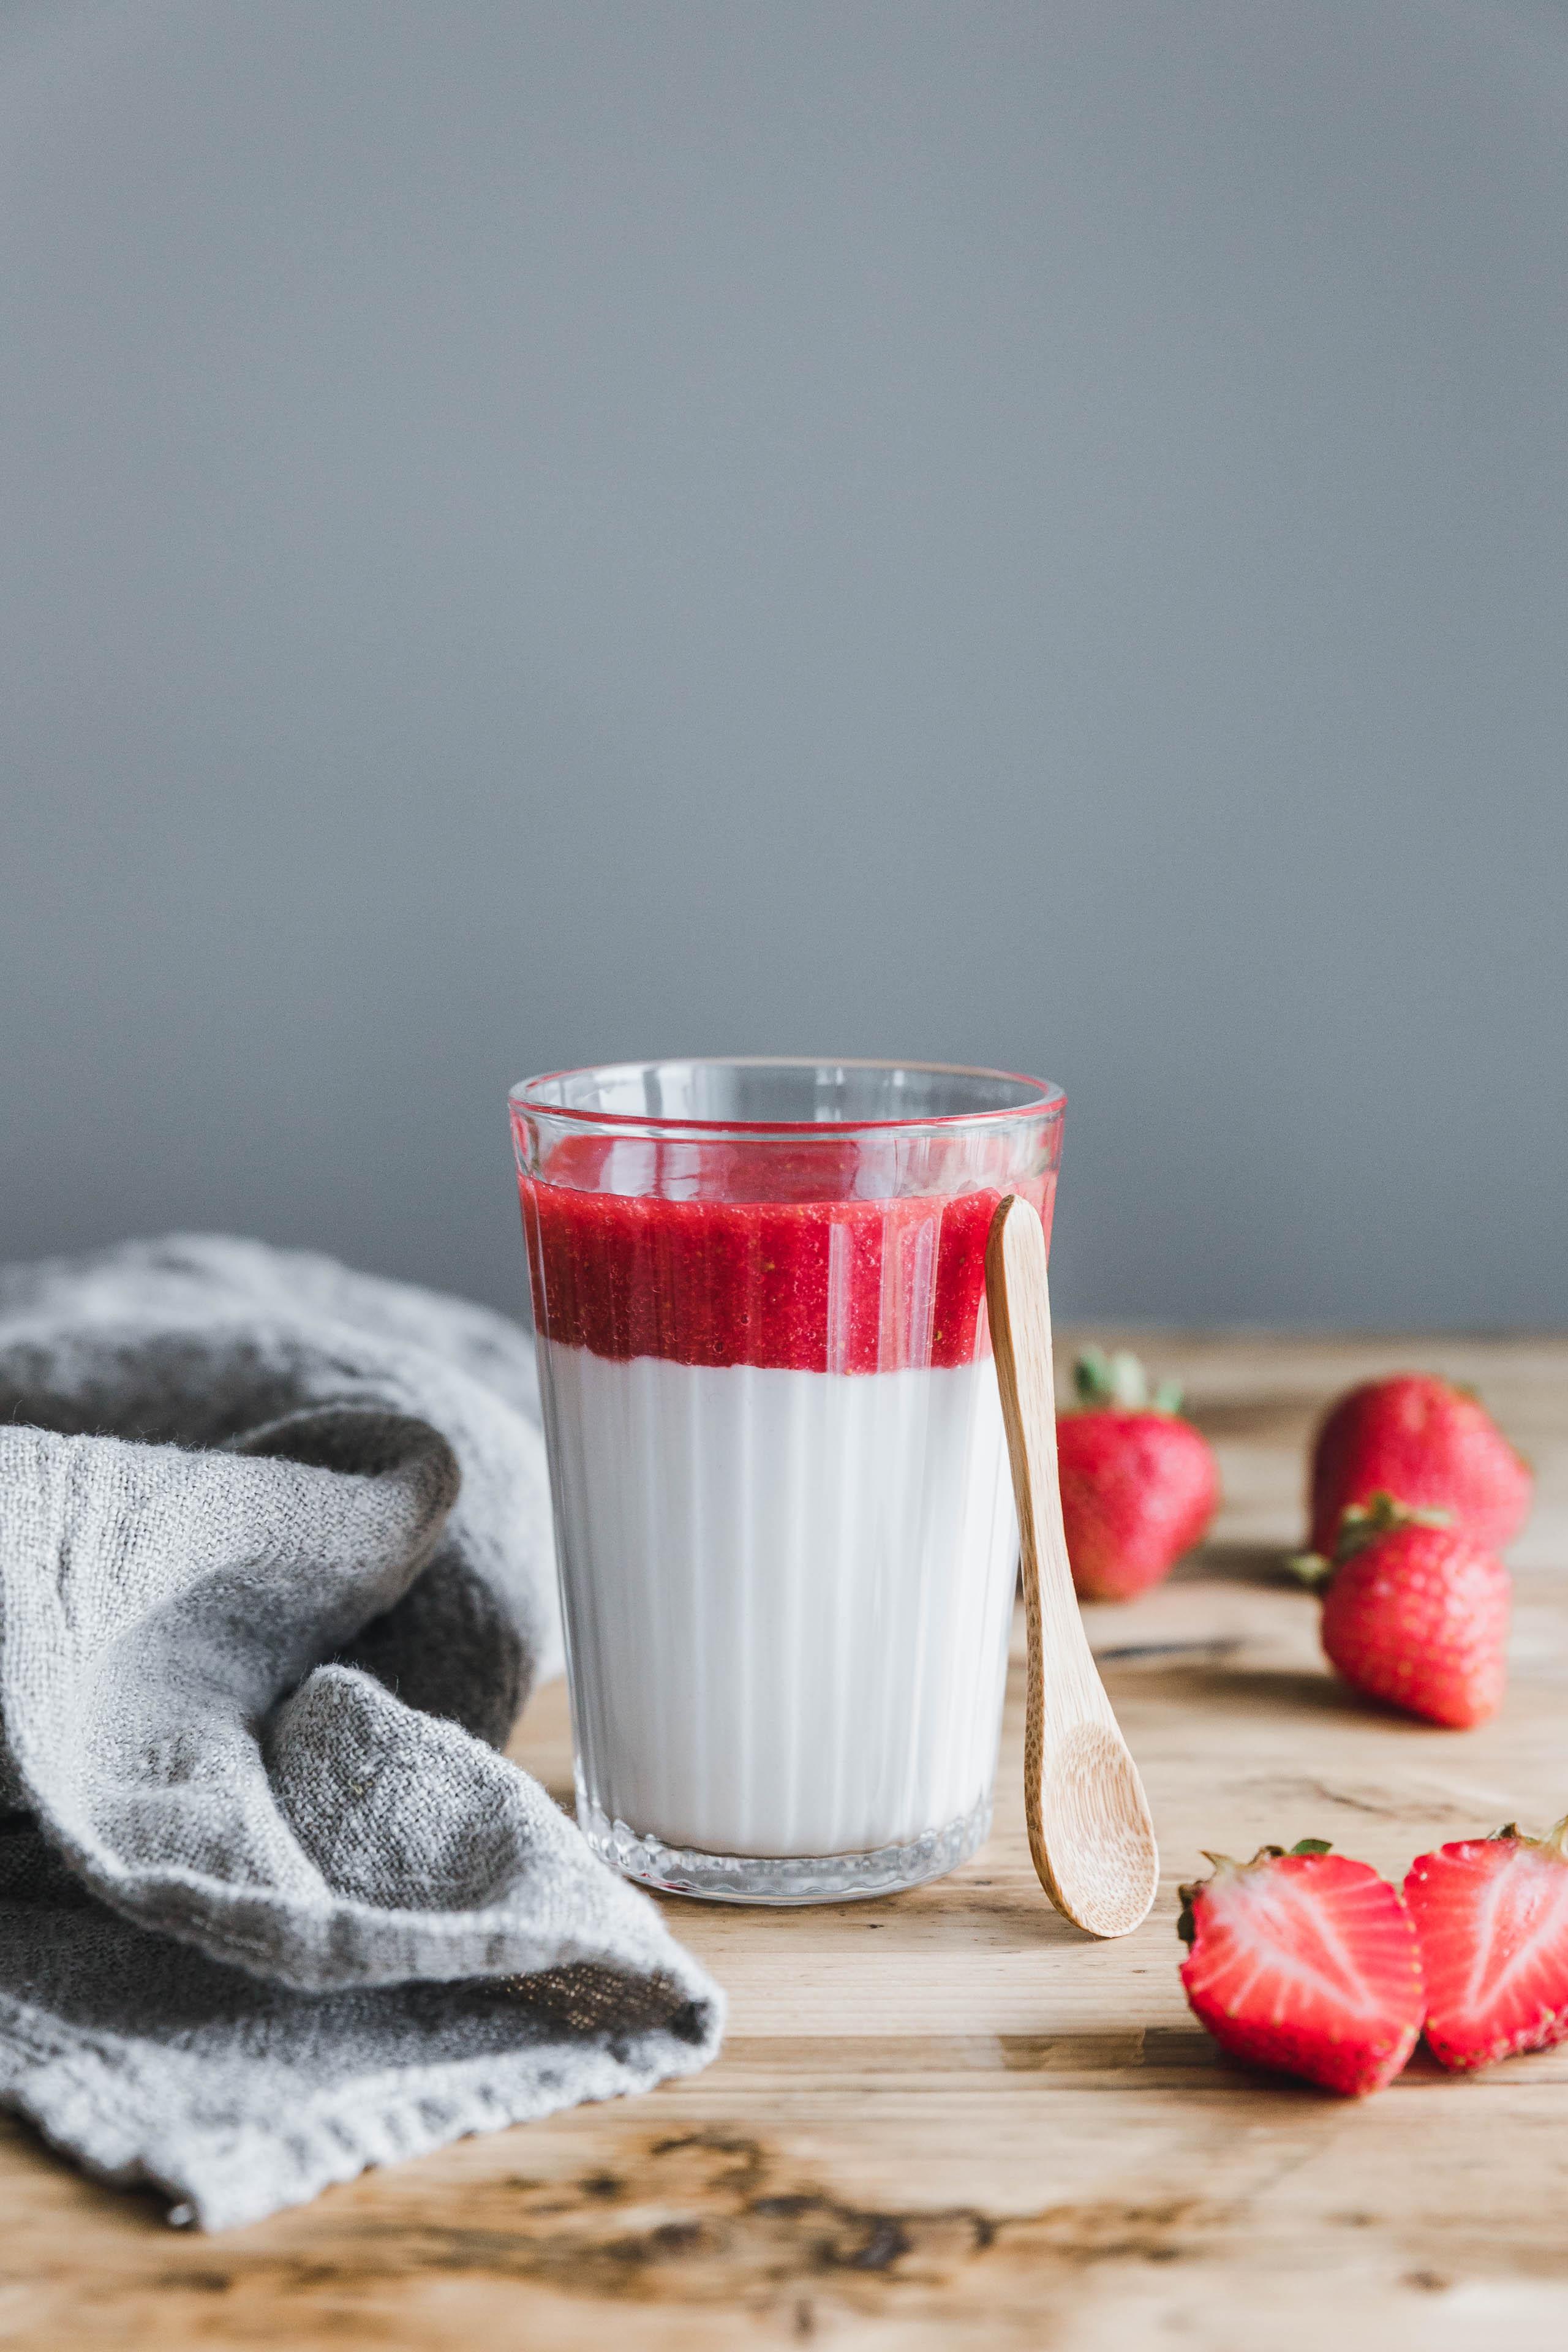 Vegane Mandel Pannacotta Mit Erdbeersauce Eat This Foodblog